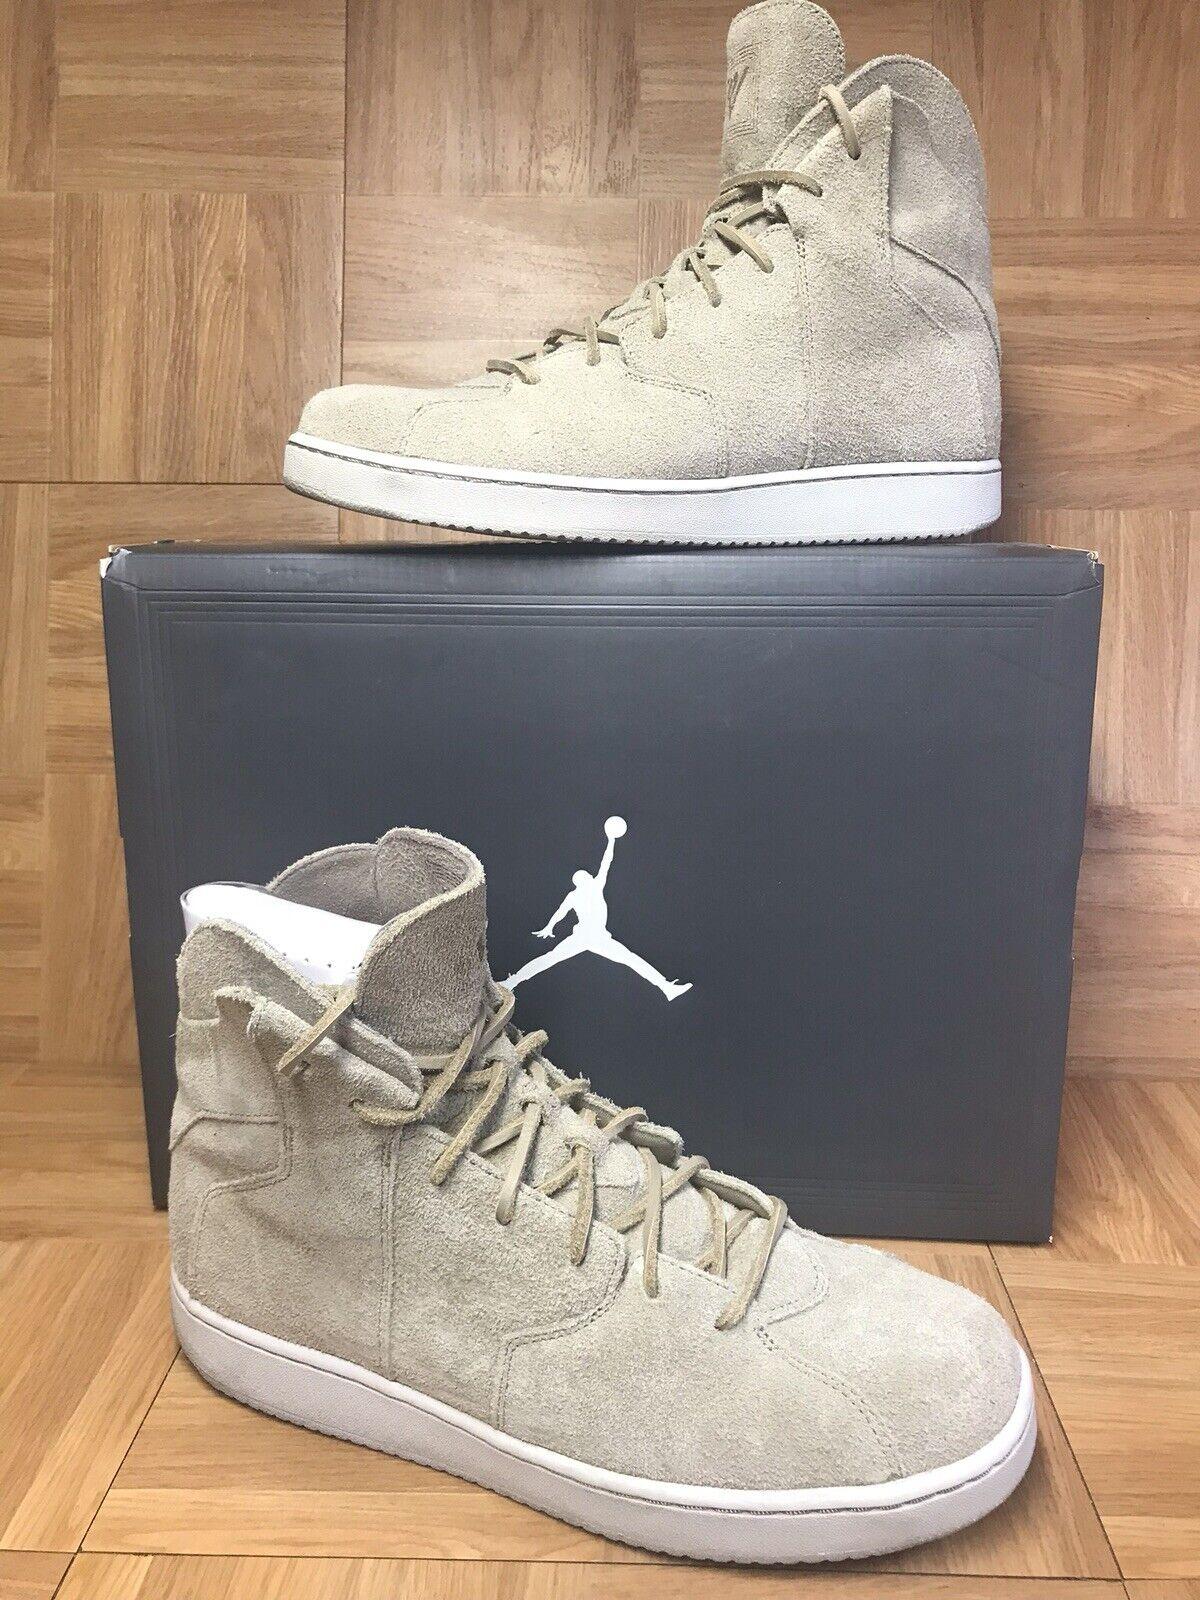 RARE Nike Air Jordan Westbrook 0.2 Khaki Suede Sz 11 854563-209 Men's shoes